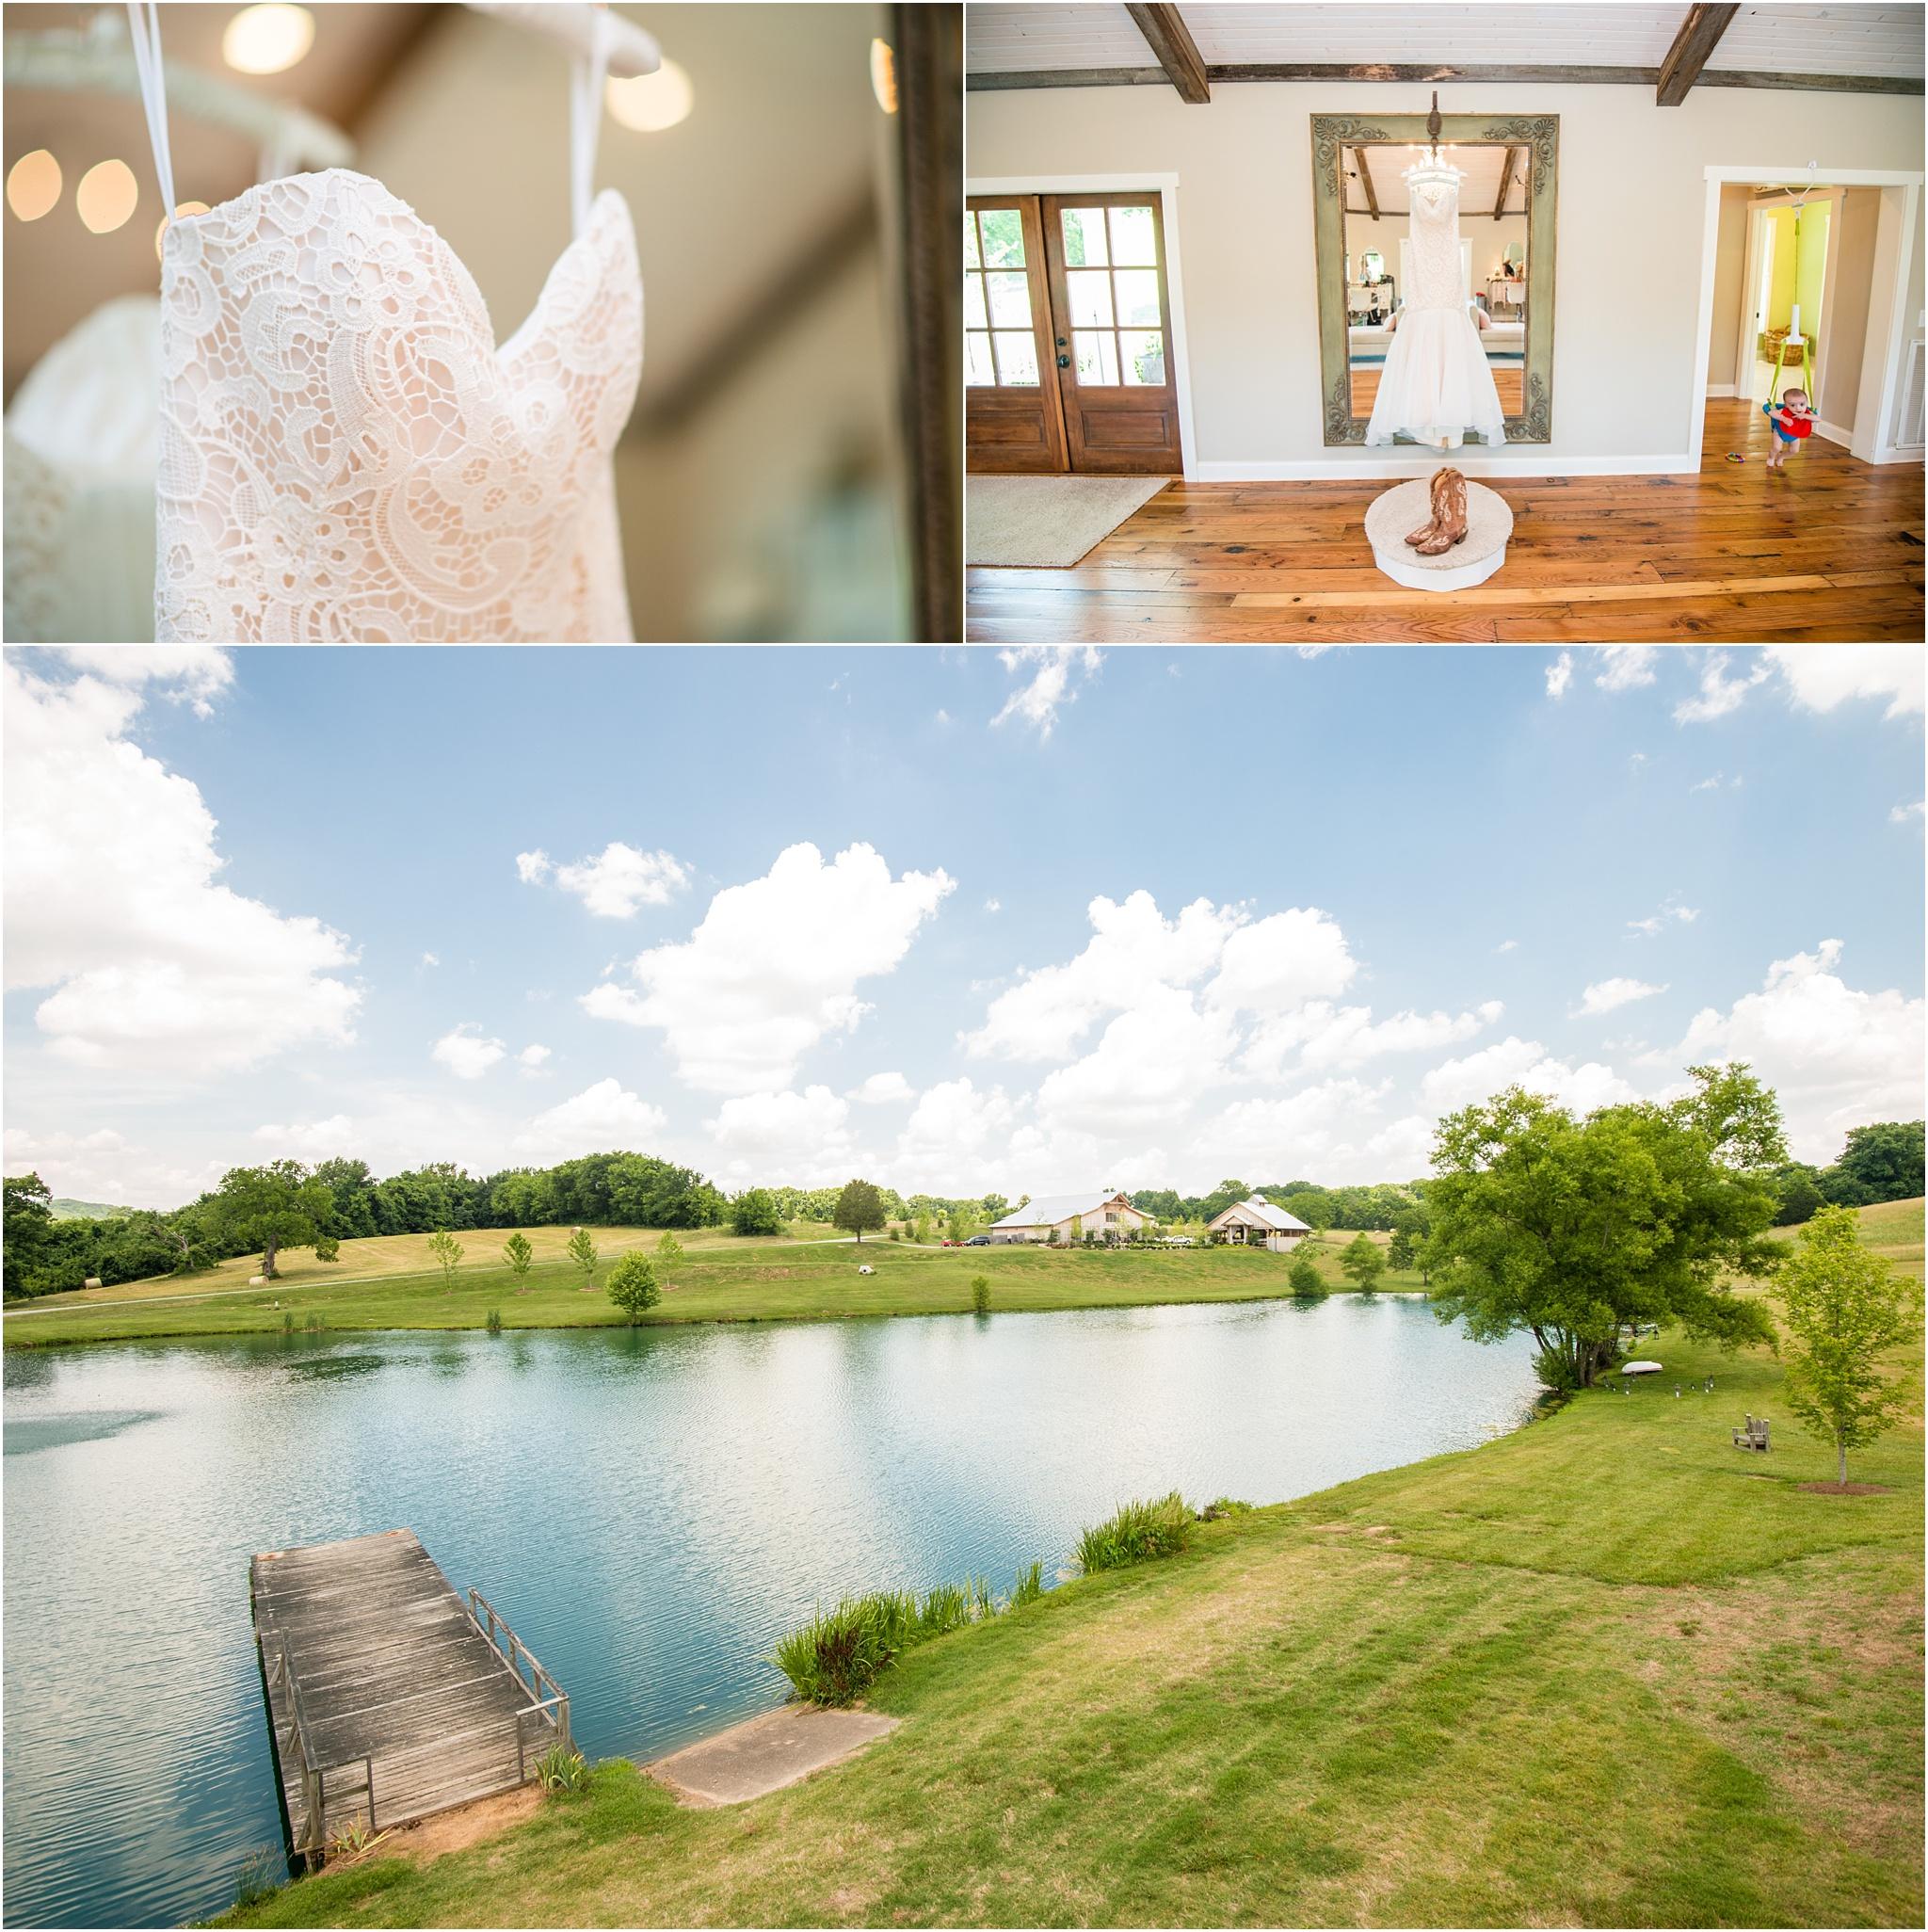 Greg Smit Photography Nashville wedding photographer Mint Springs Farm 1